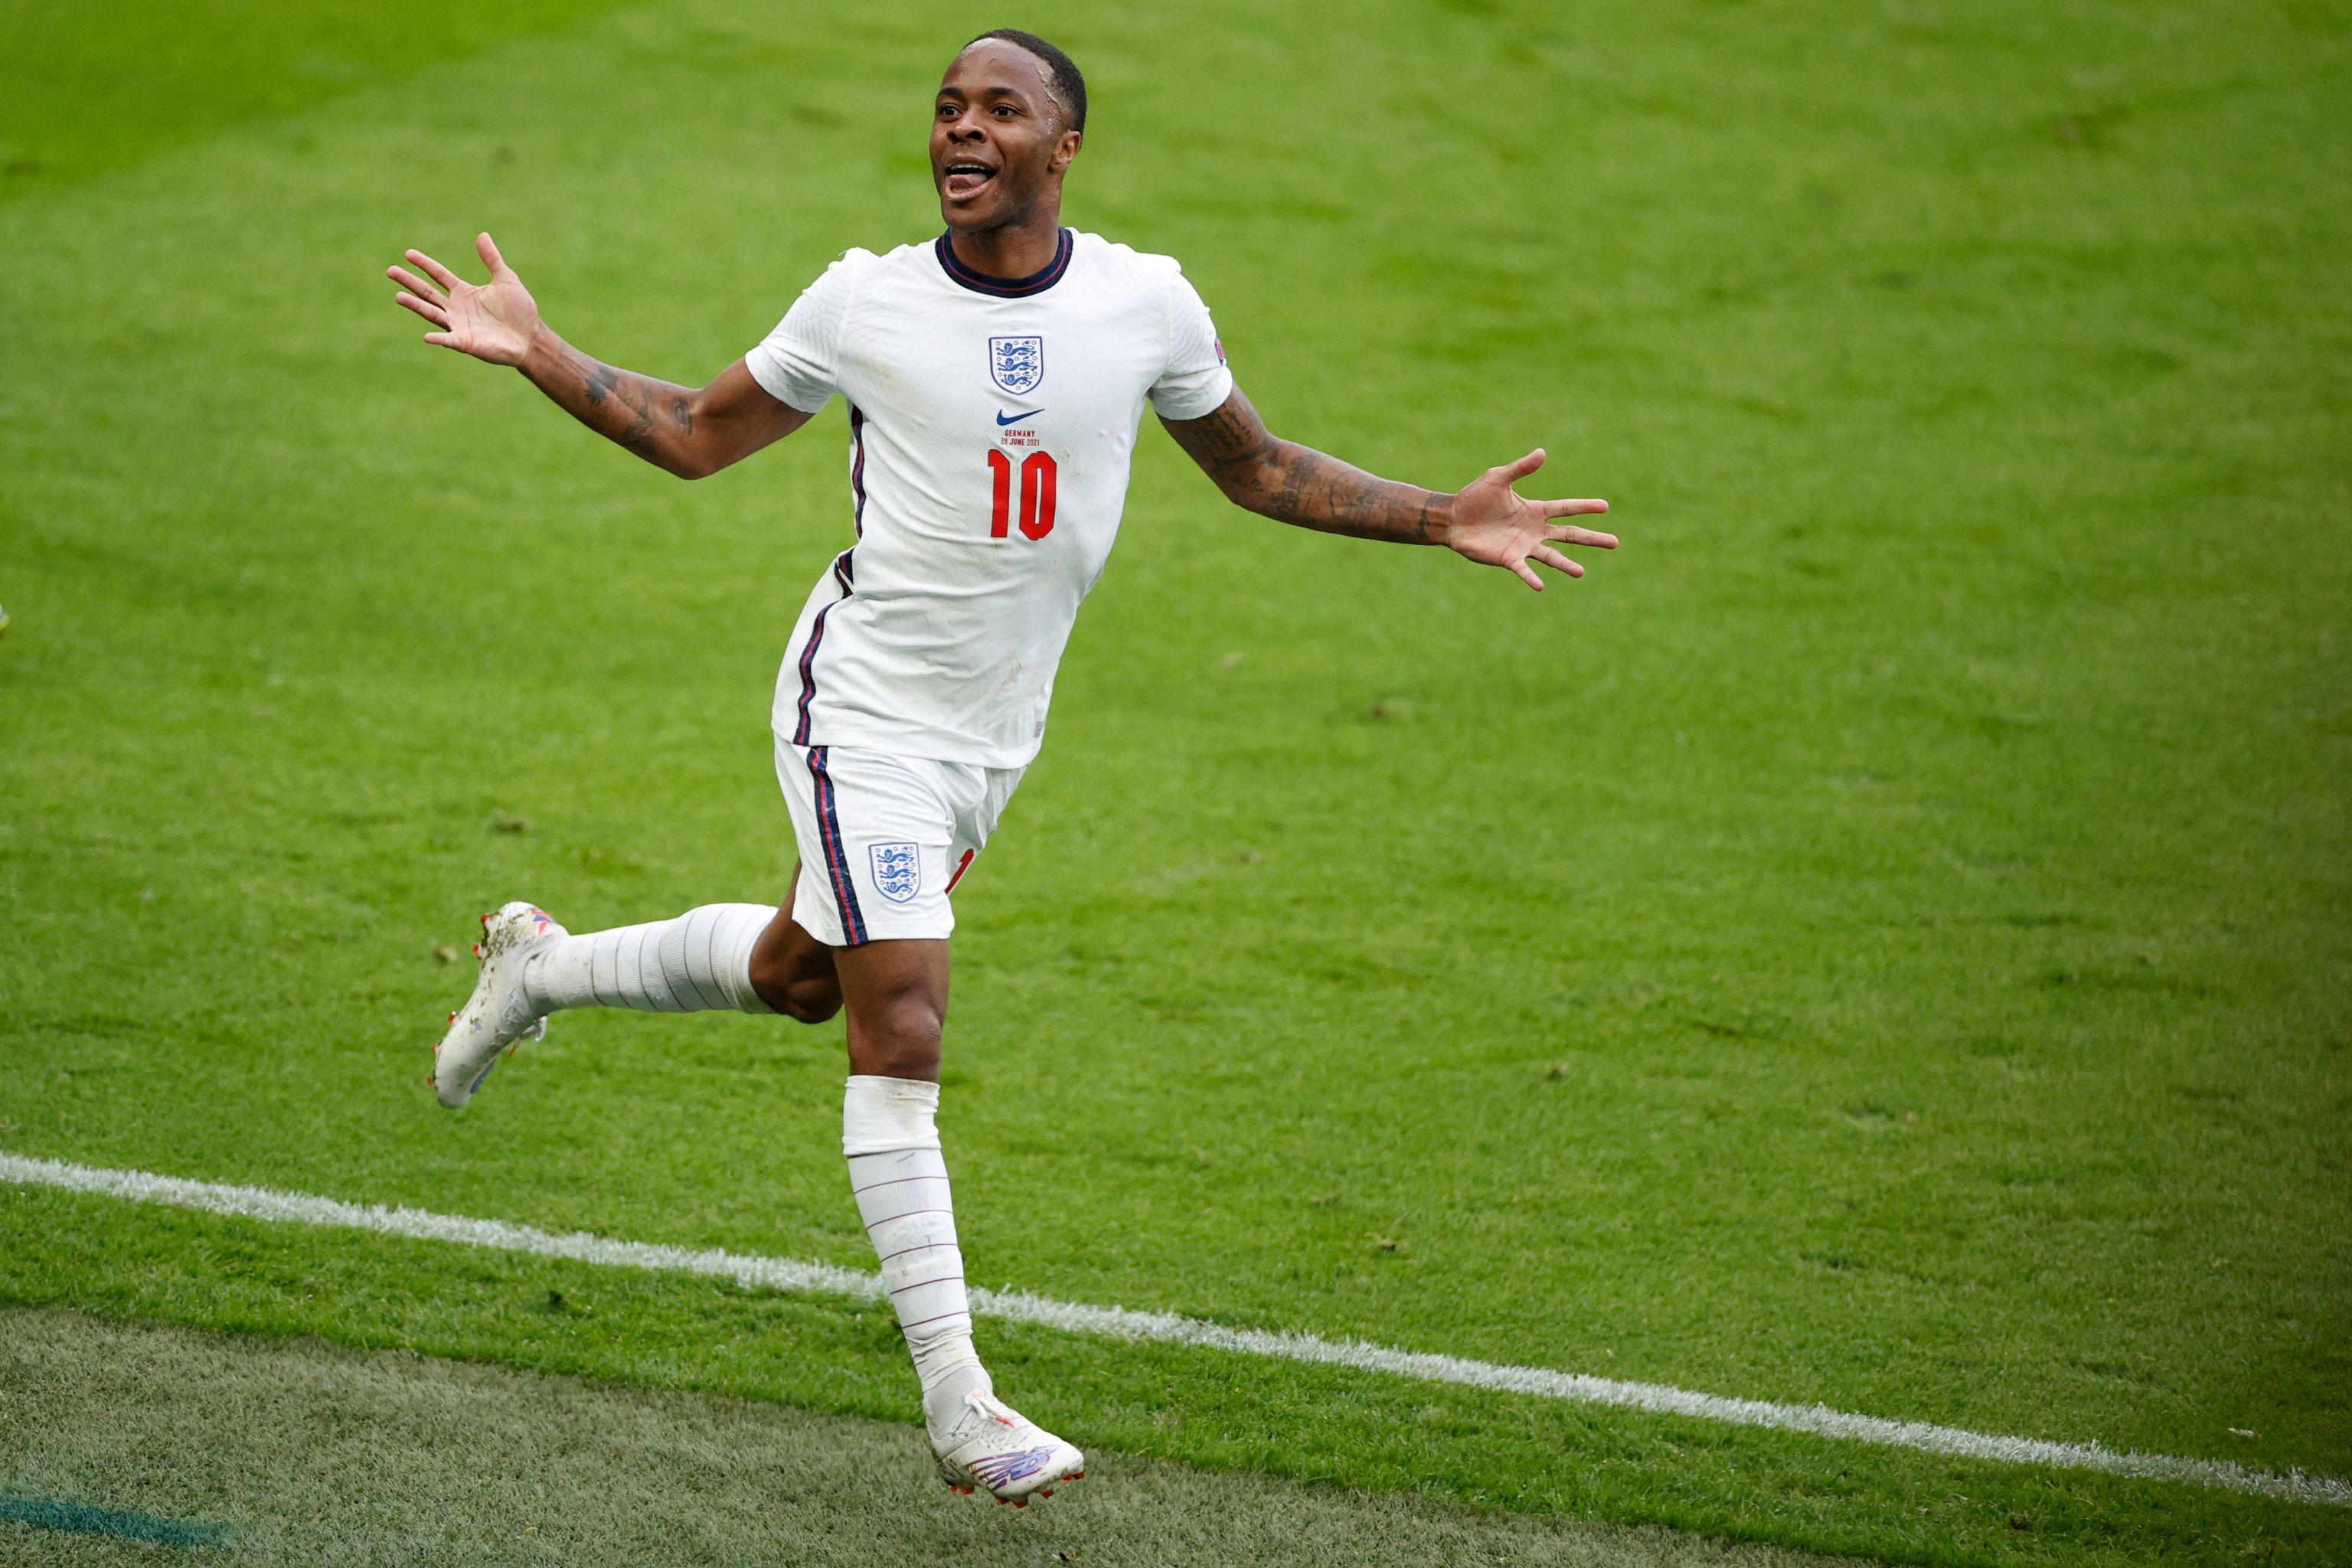 Sterling celebra su gol contra Alemania